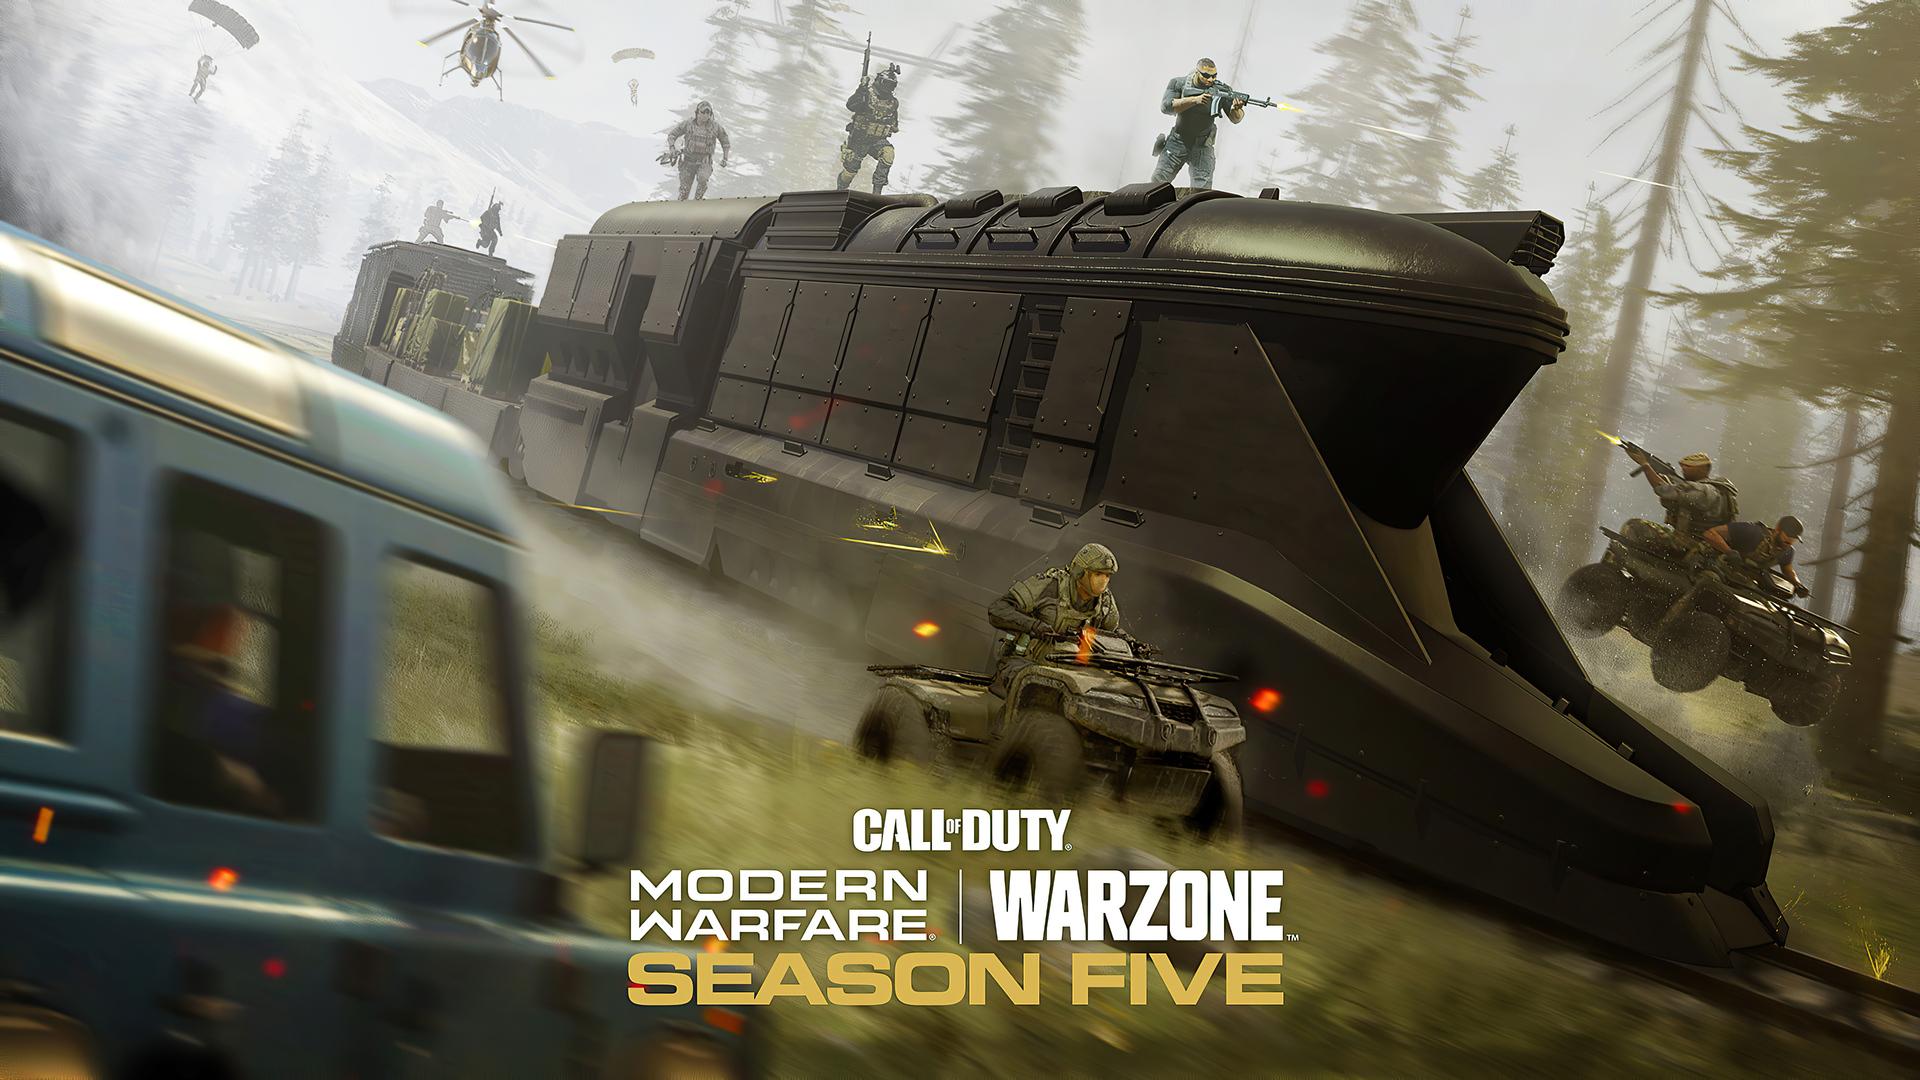 call-of-duty-modern-warfare-season-5-l0.jpg